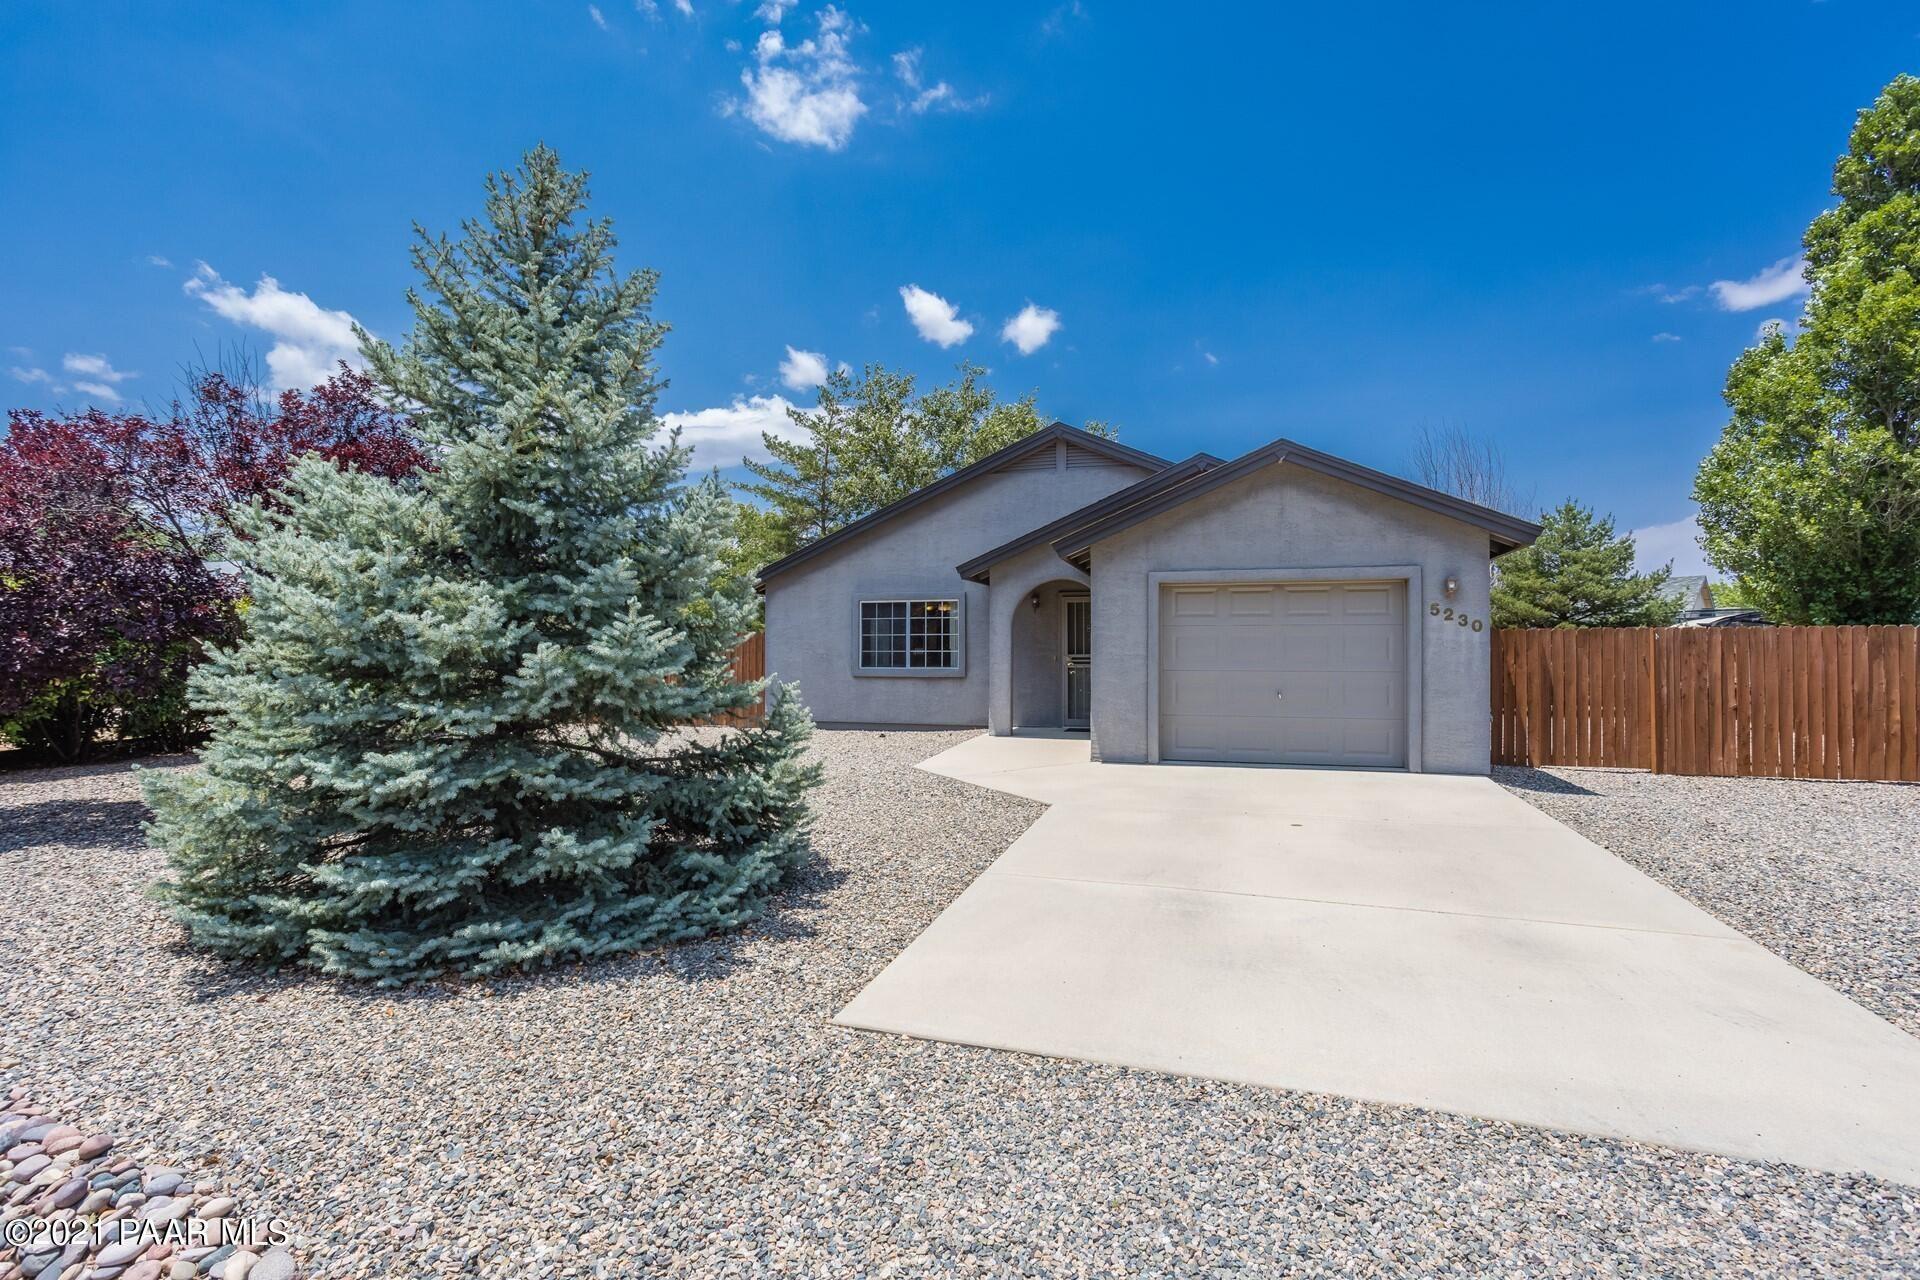 Photo of 5230 N Western Boulevard #Lot: 5475, Prescott Valley, AZ 86314 (MLS # 1040438)